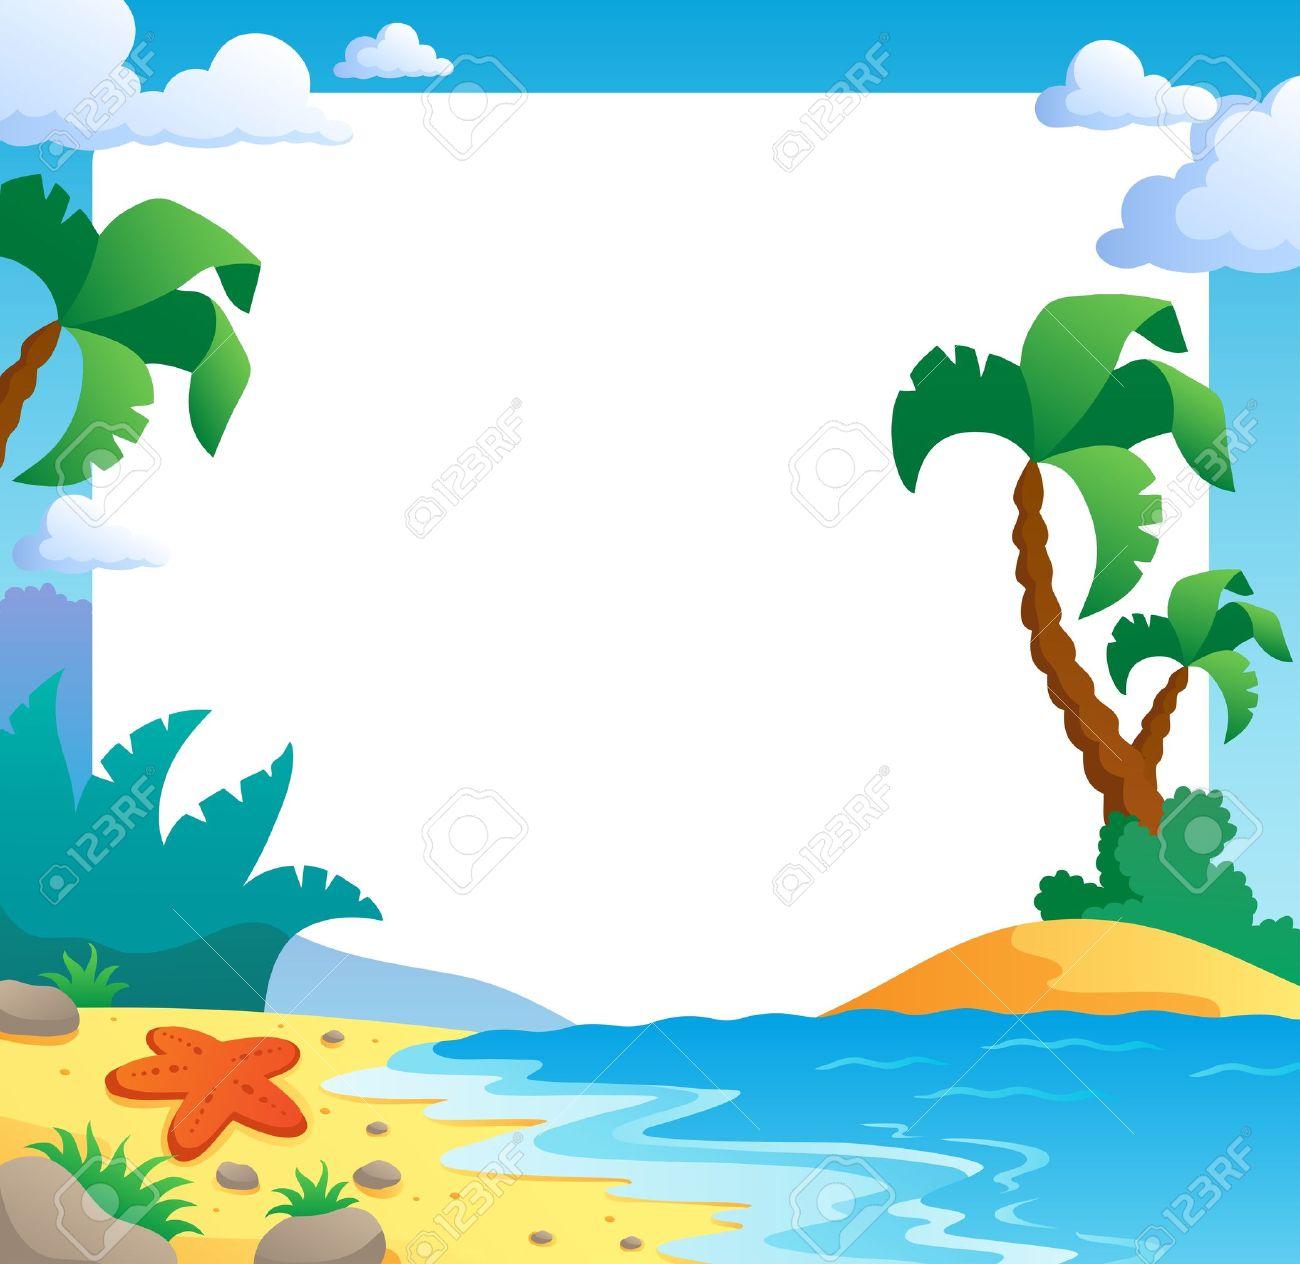 Beach theme frame 1 - vector illustration Stock Vector - 12895900